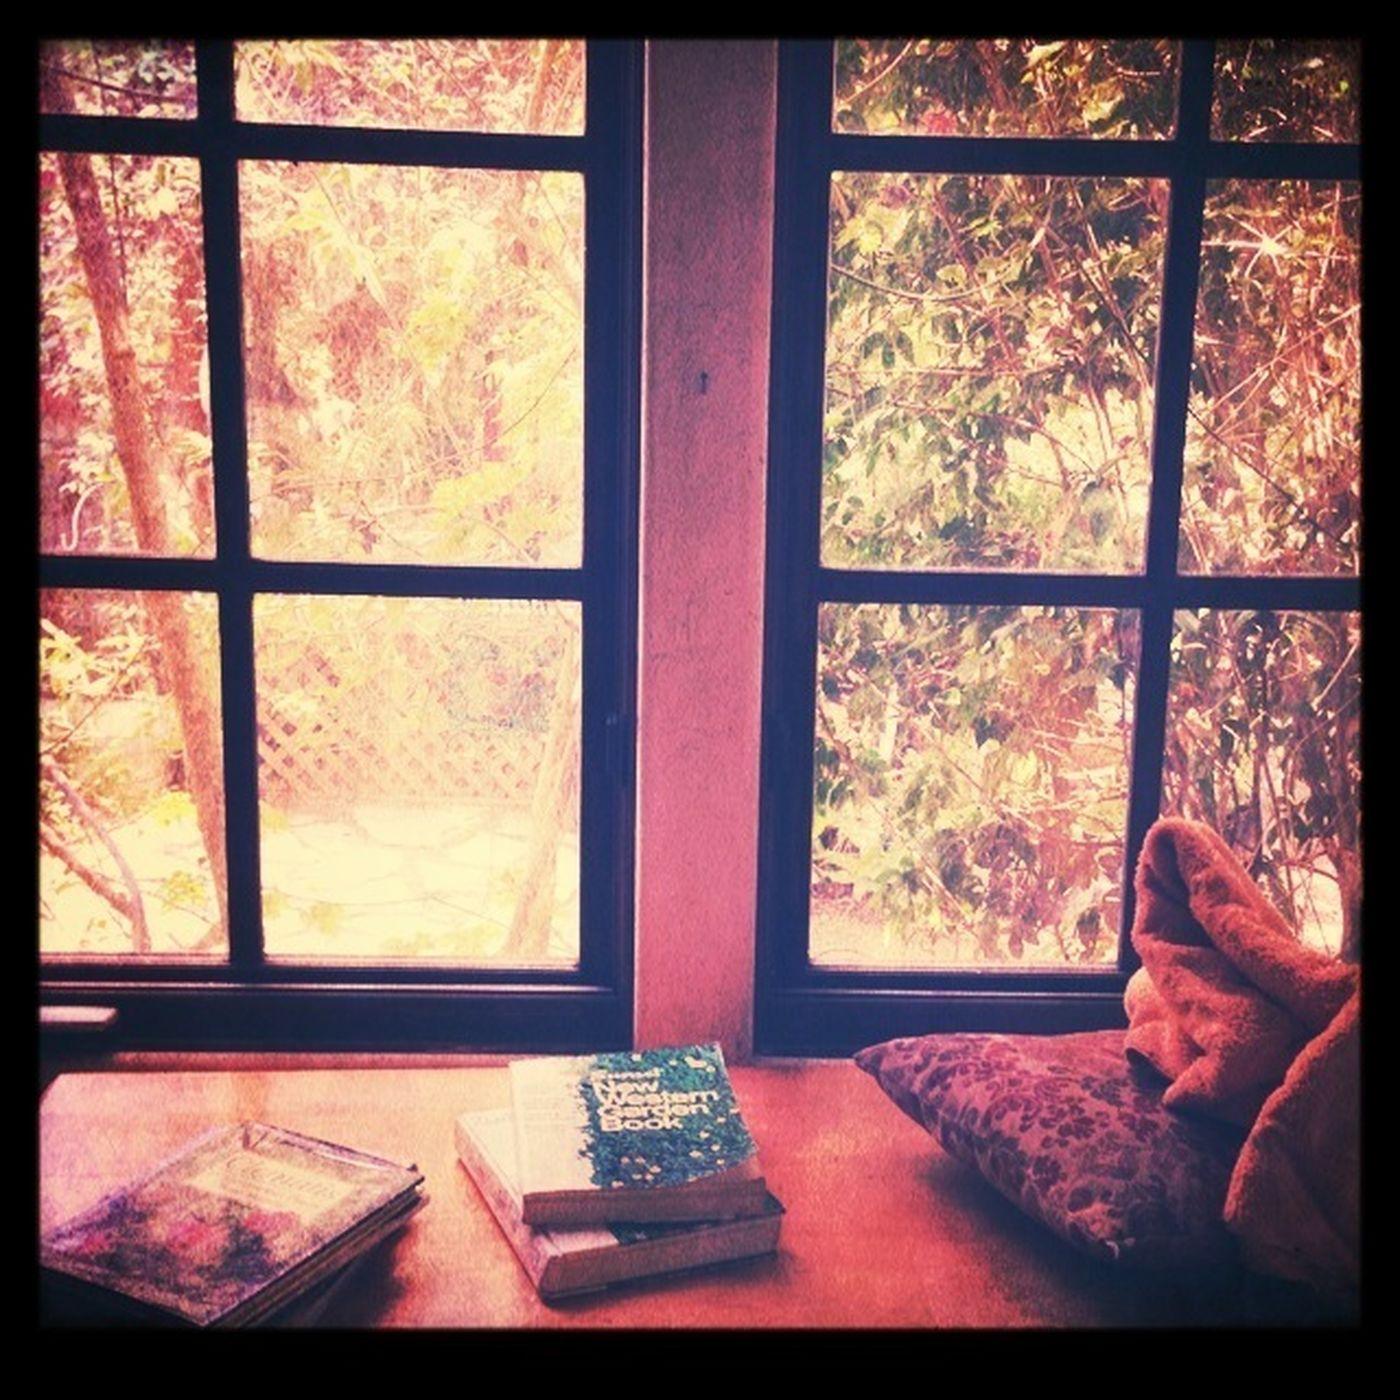 Reading & Relaxing San Diego Buena Creek Gardens